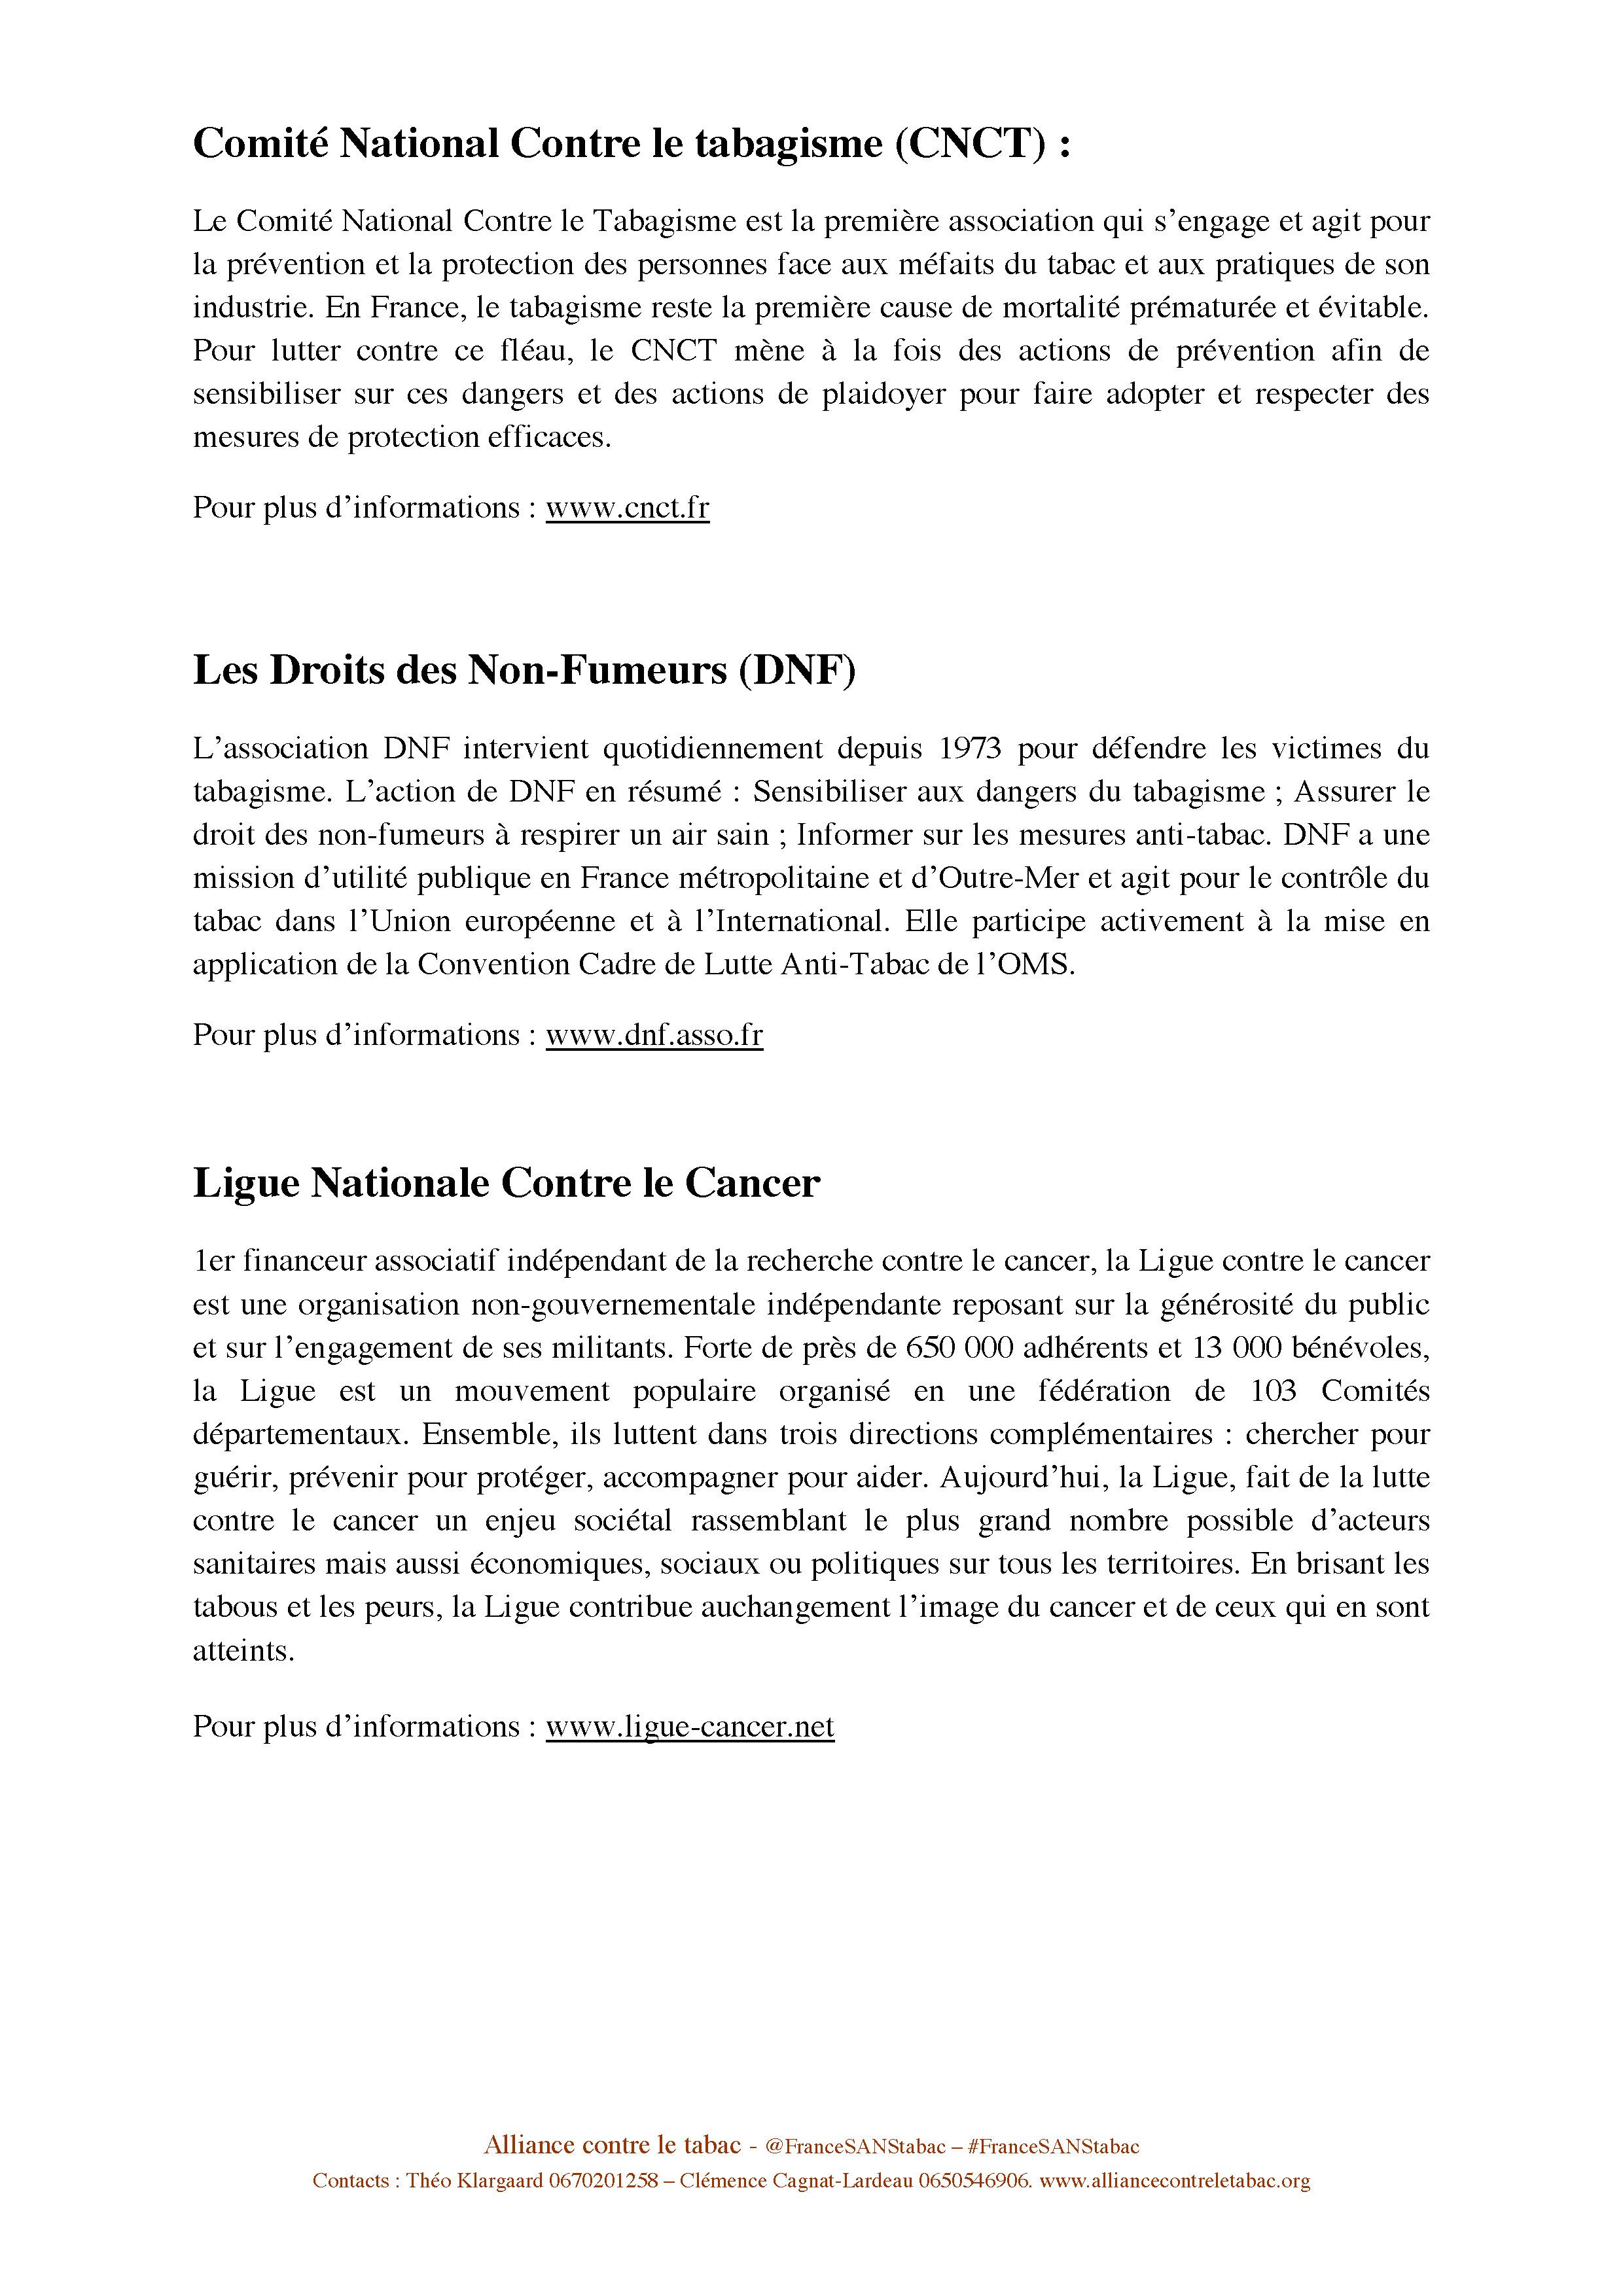 Alliance-DP_journee-mondiale-sans-tabac-avec-annexes-vf-30mai2016_Page_06.jpg